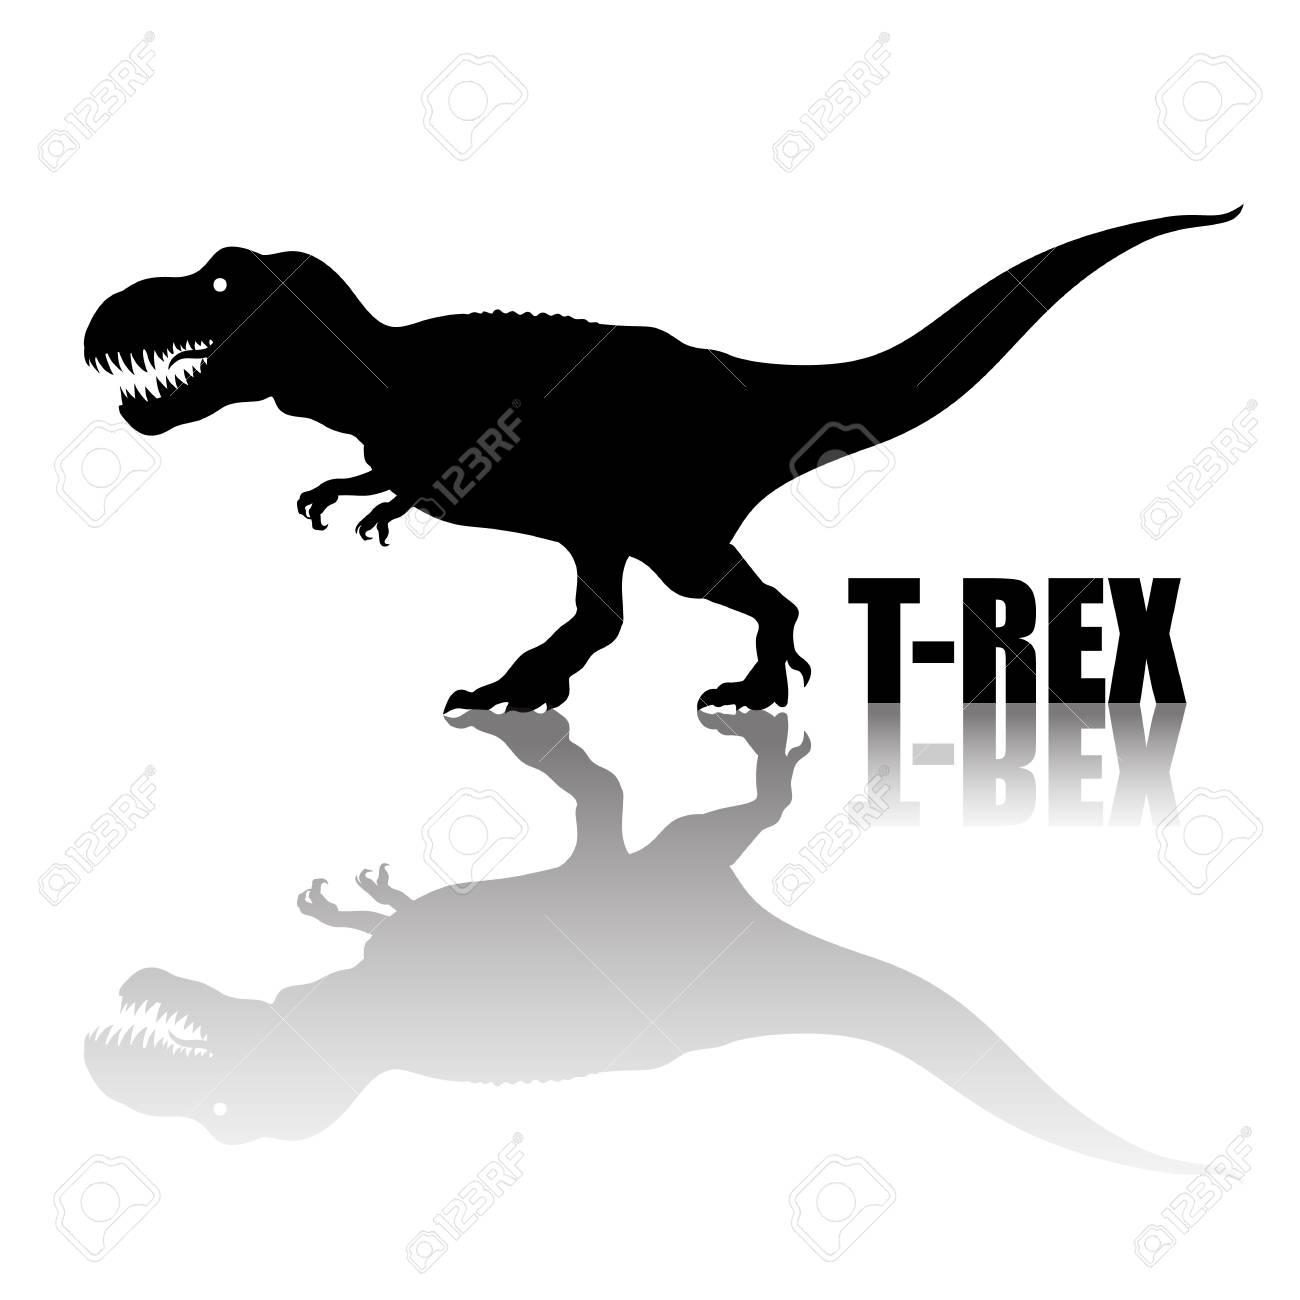 Trex clipart little dinosaur, Trex little dinosaur Transparent FREE for  download on WebStockReview 2020